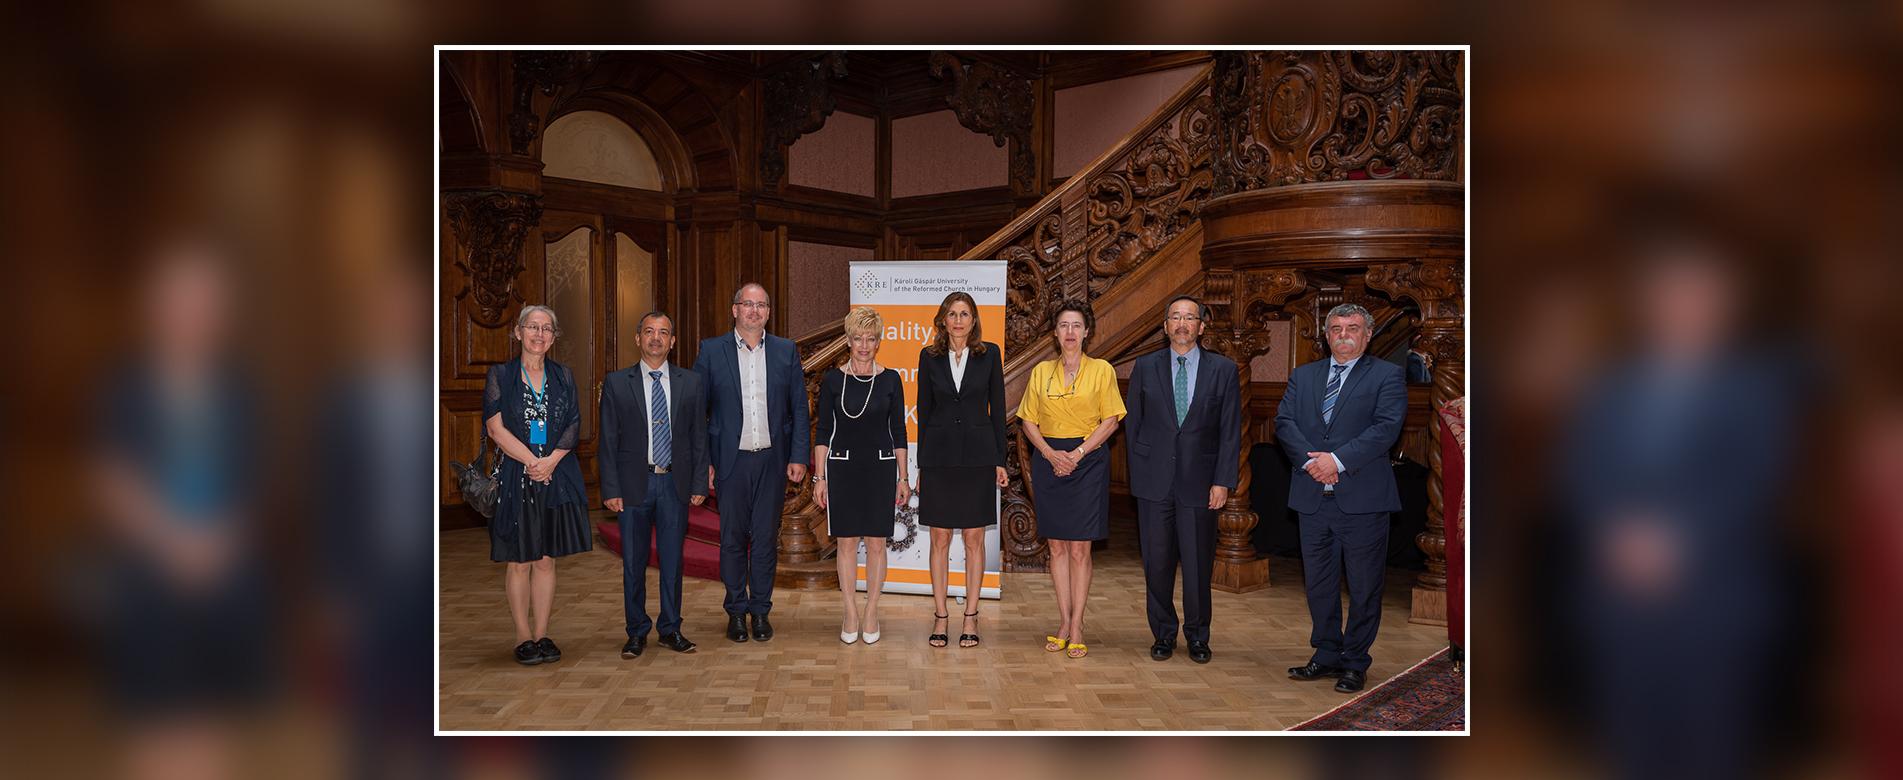 Ambassadors' visit to the Károlyi-Csekonics Palace